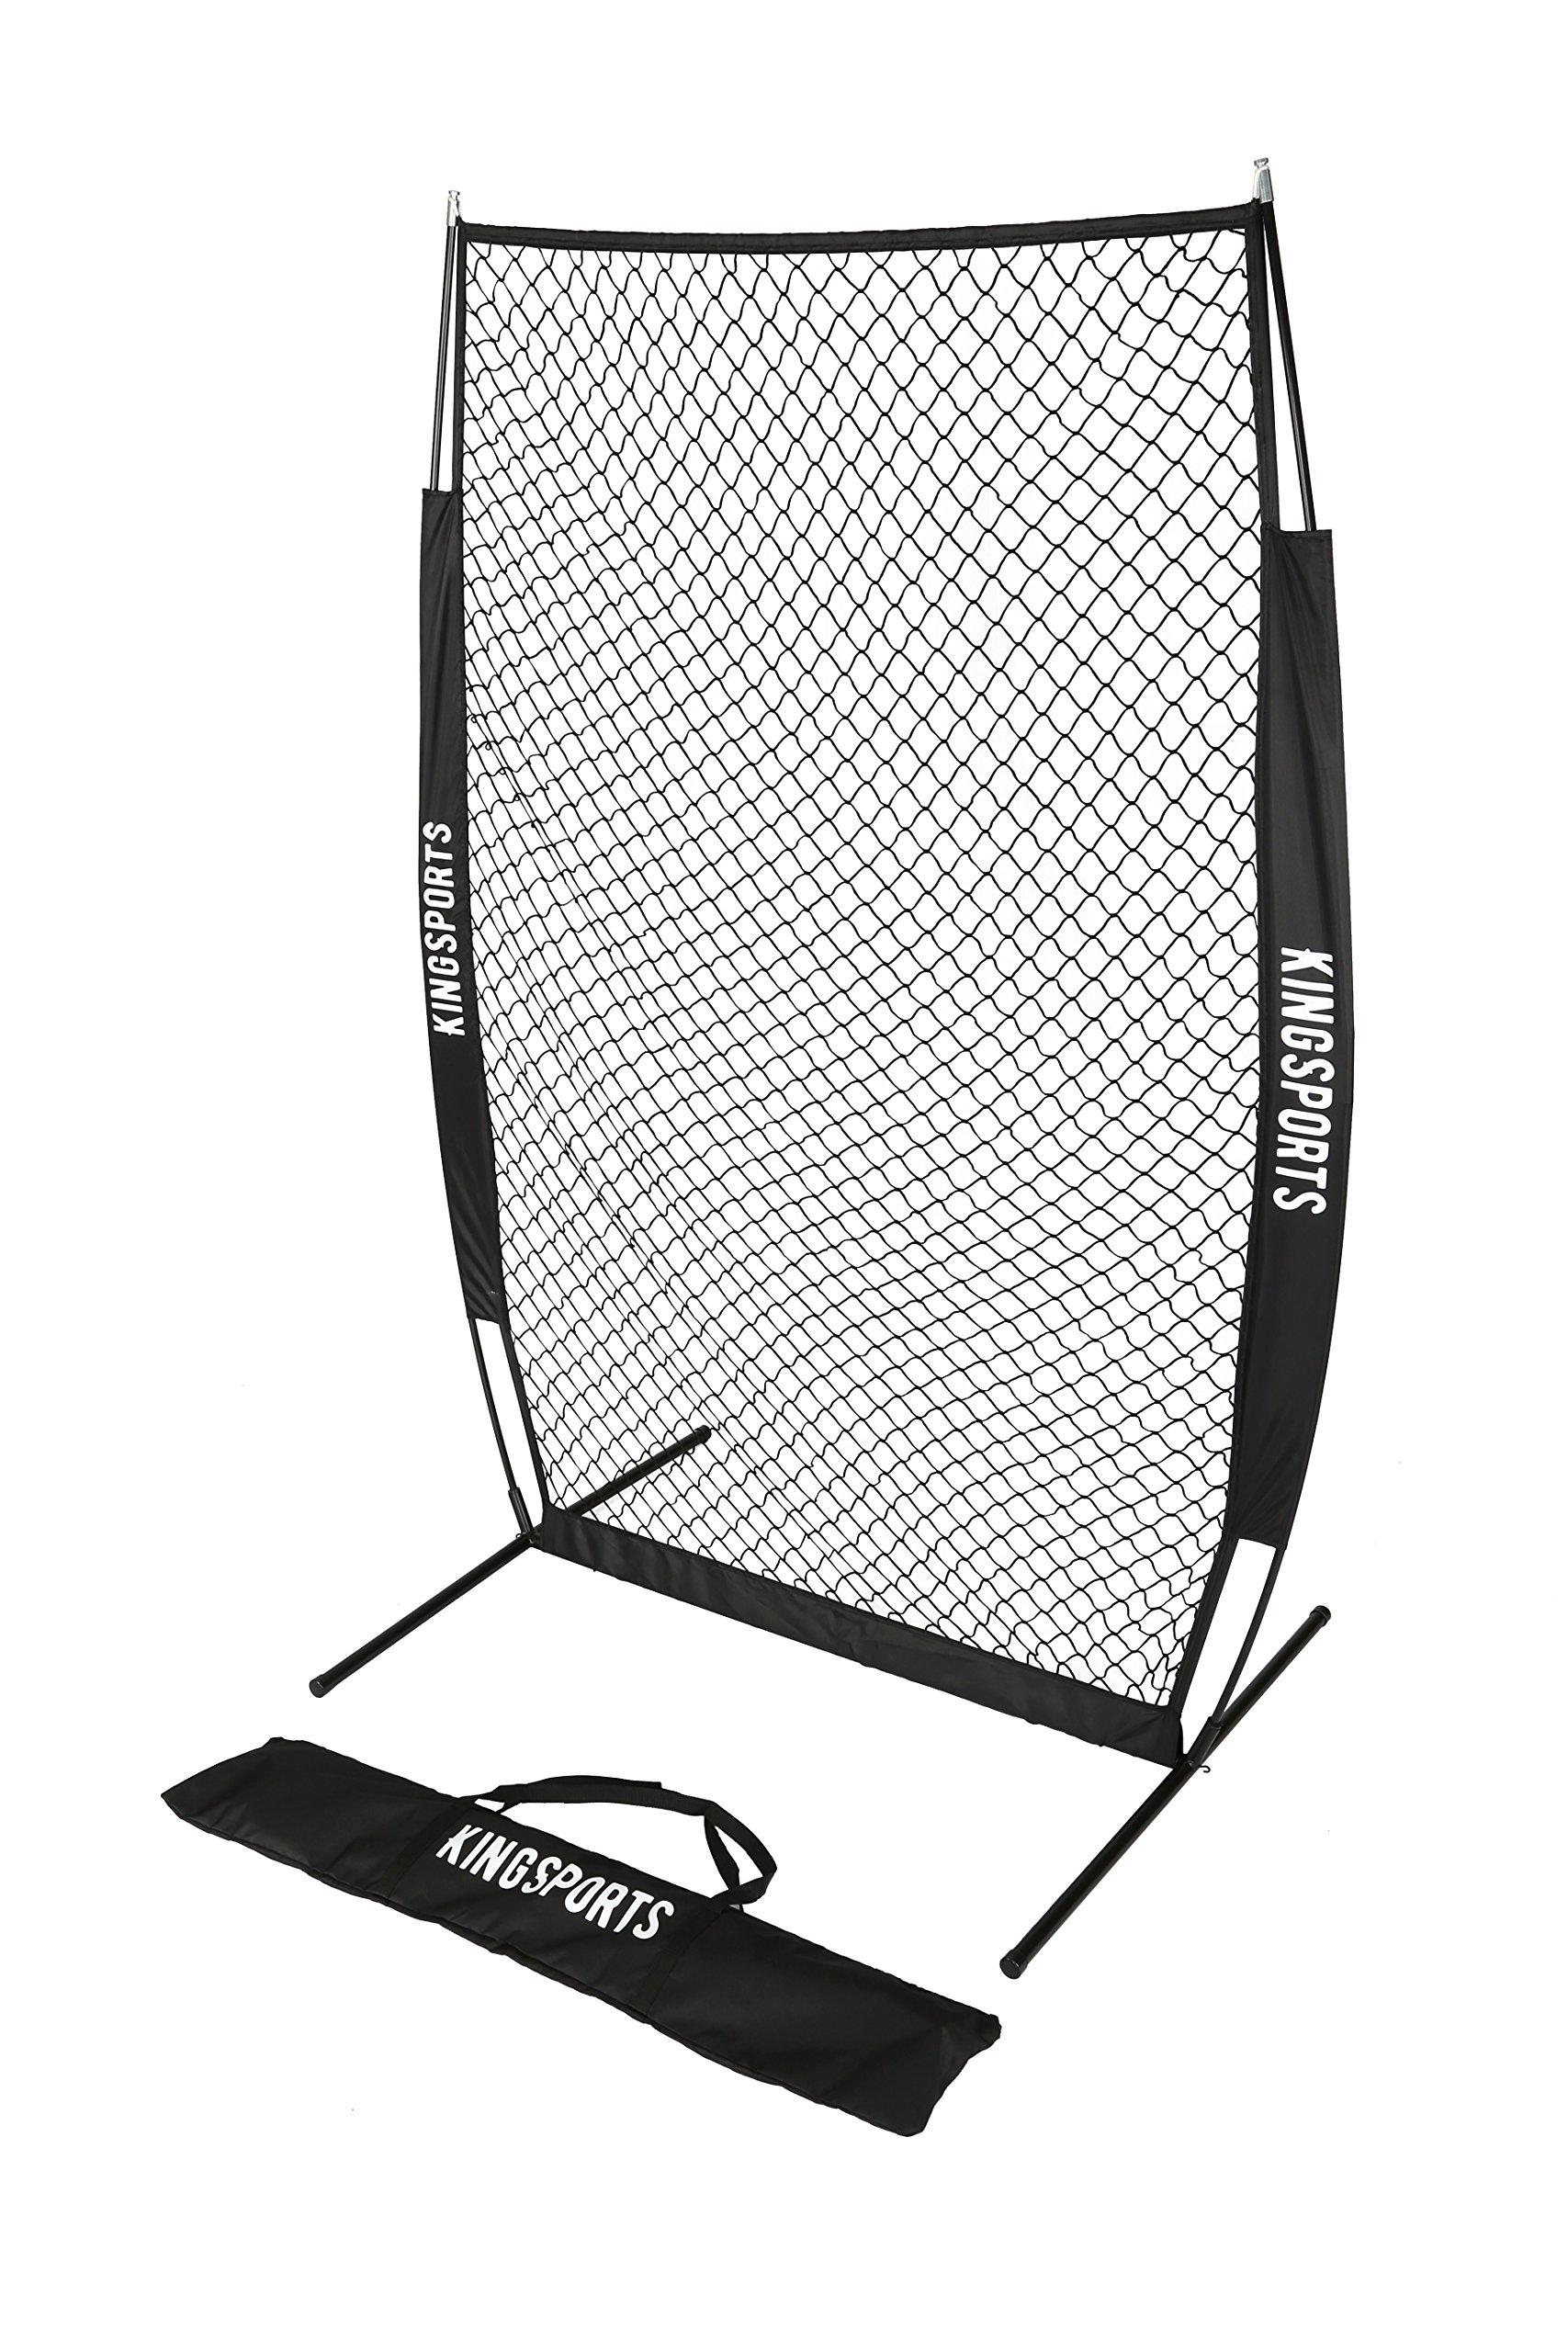 KingSports I-Screen Net, Protective Baseball Net/Protective Softball Pitching Screen with Bow Frame and Carry Bag